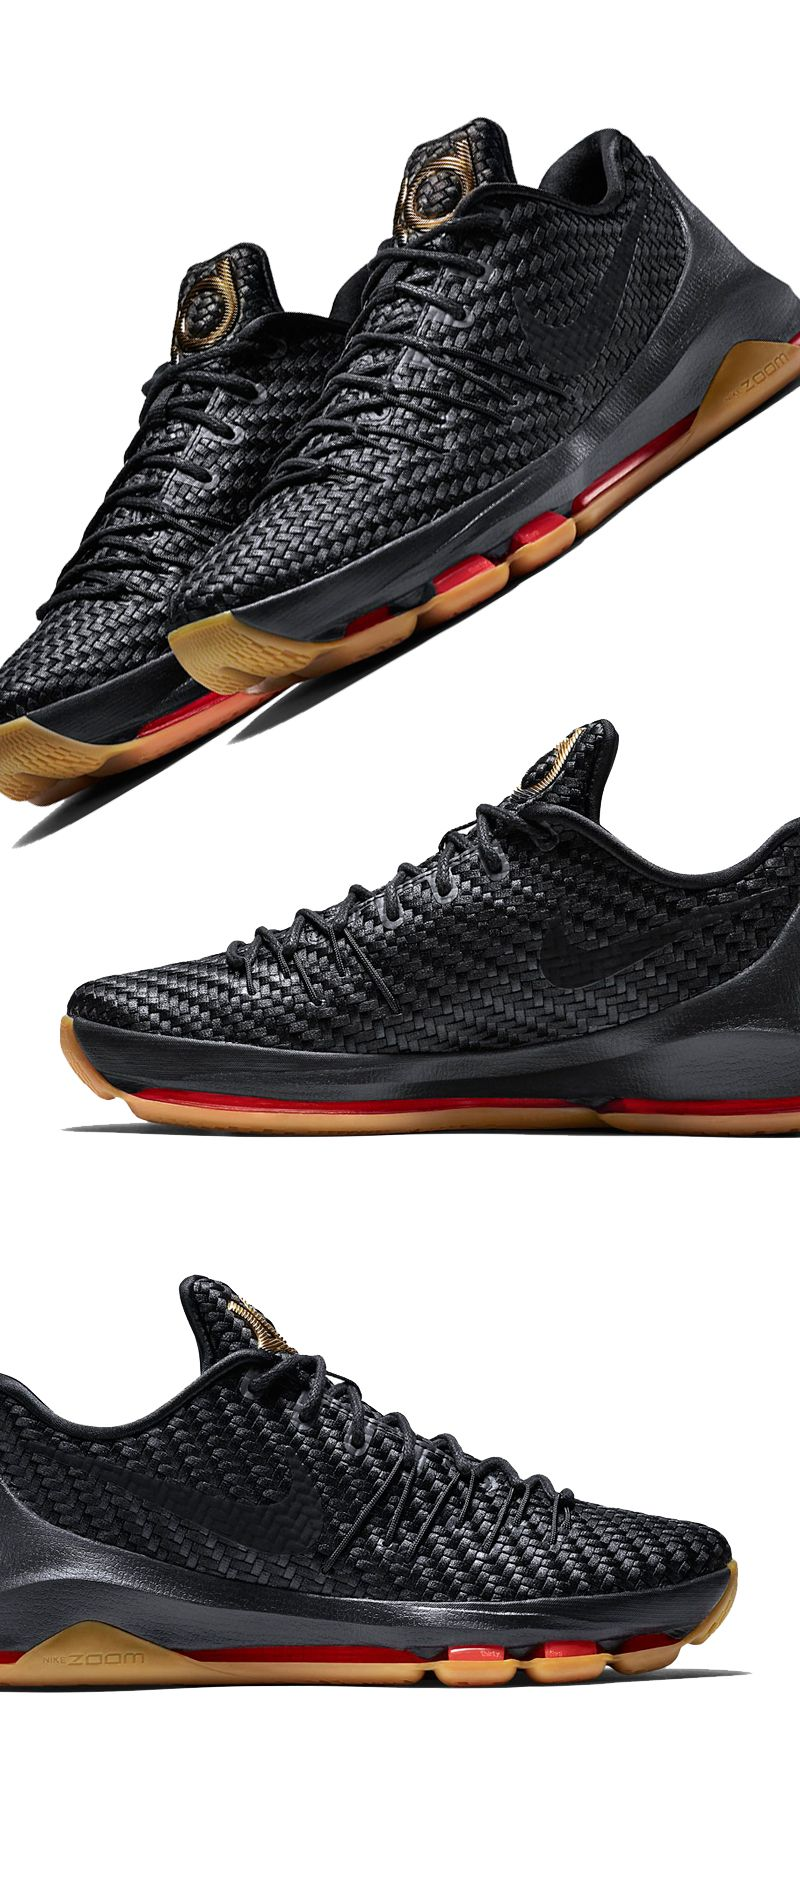 Calzado Nike Pretty Pinterest 8 Styles Kd Tenis Y The Zapatillas qHFzOq